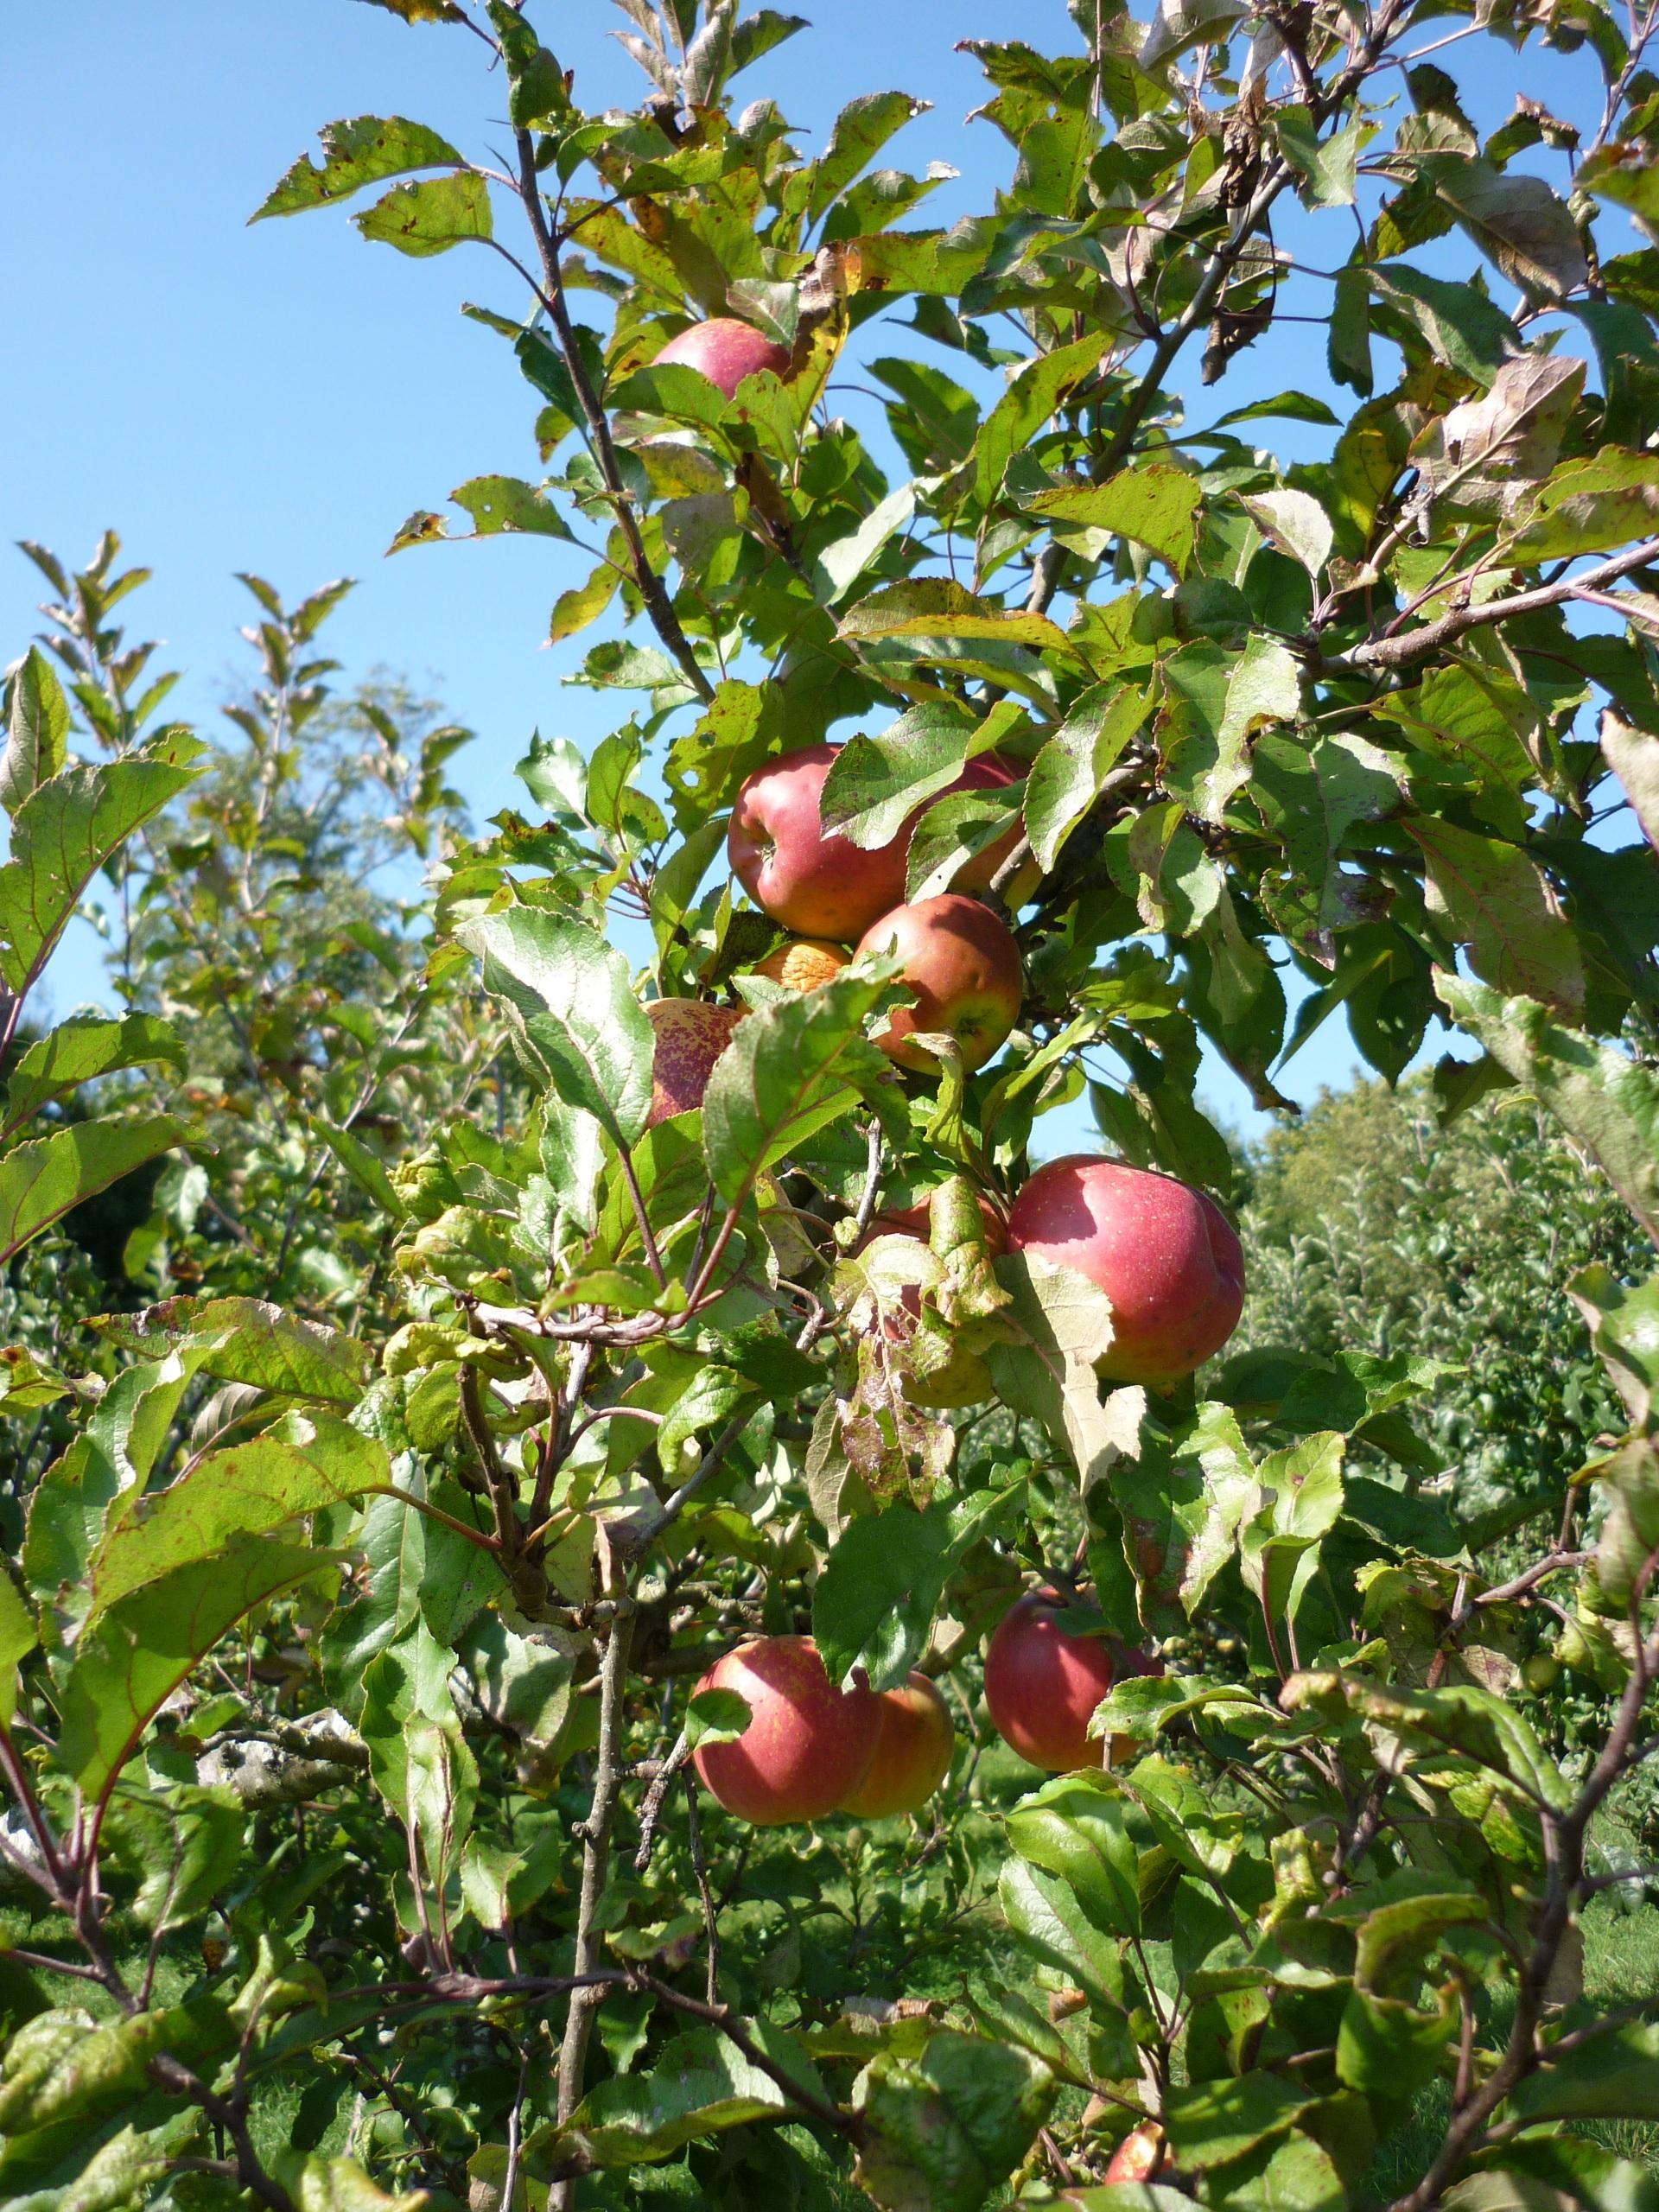 Fotos gratis manzana rbol rama fruta flor huerta for Arboles frutales de hoja perenne para jardin